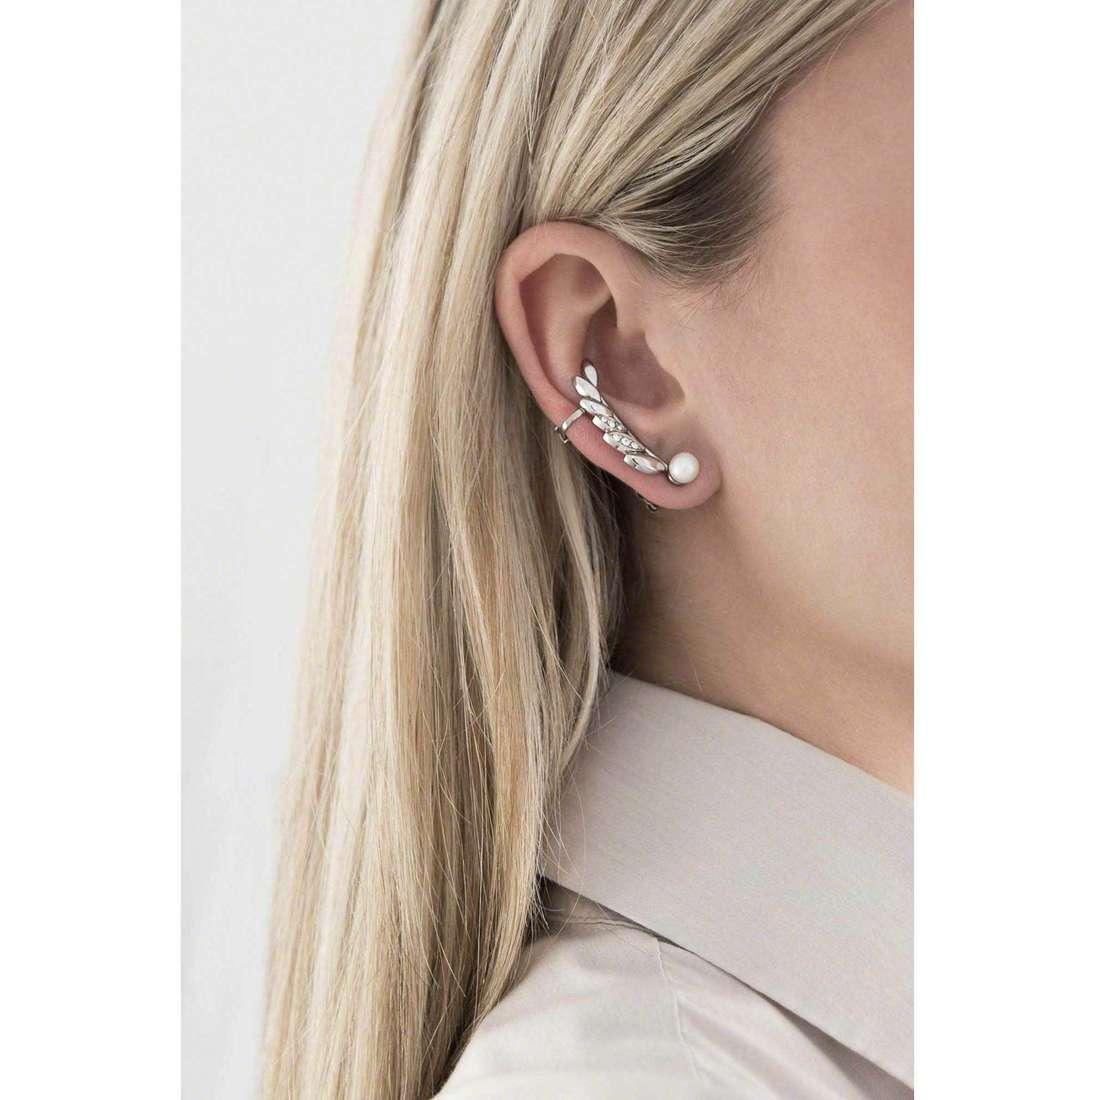 Morellato earrings Gioia woman SAER22 indosso